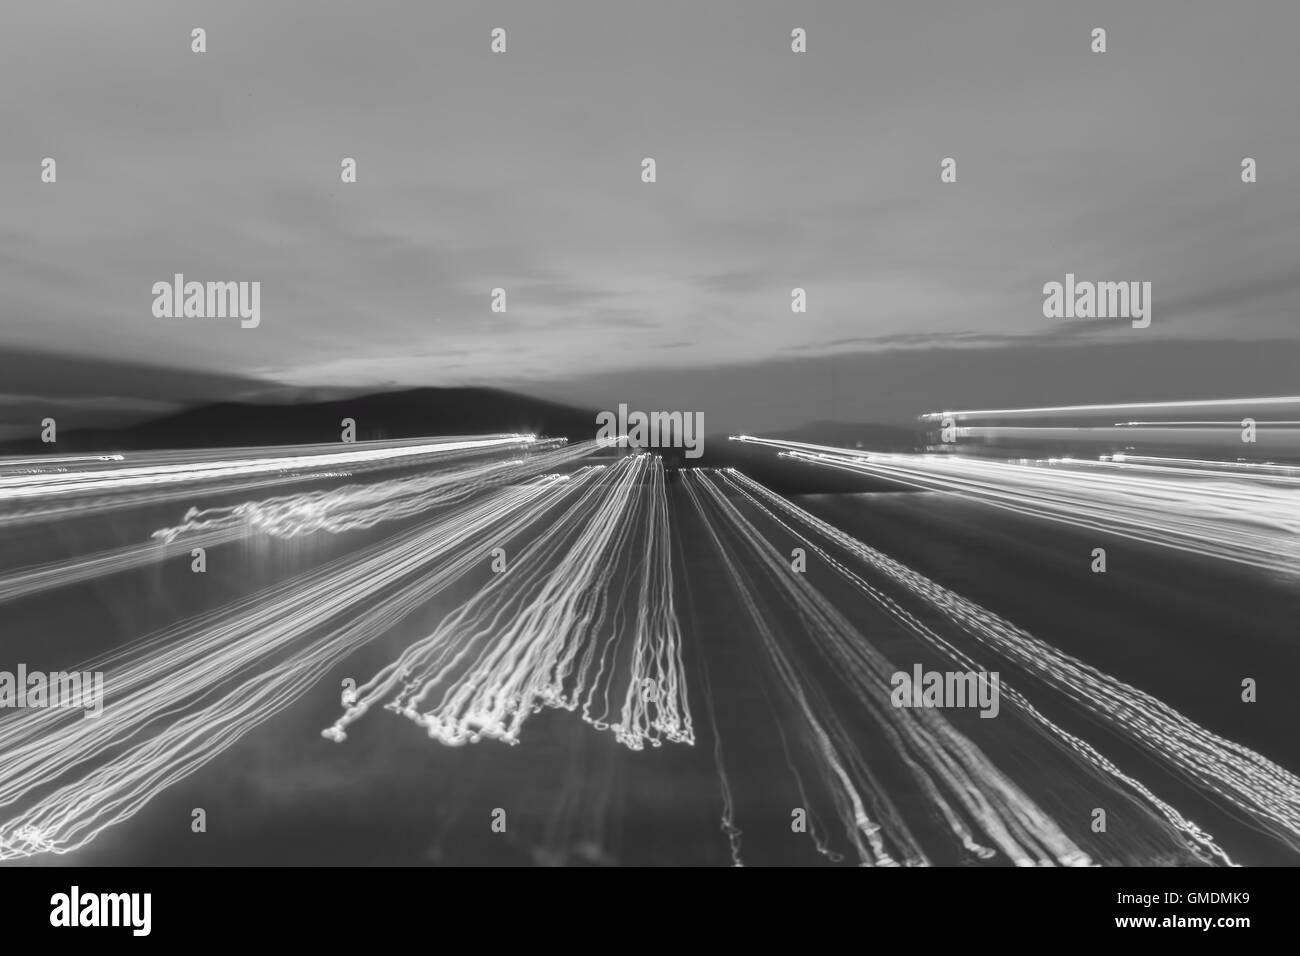 Black & white light at night. Background pattern - Stock Image